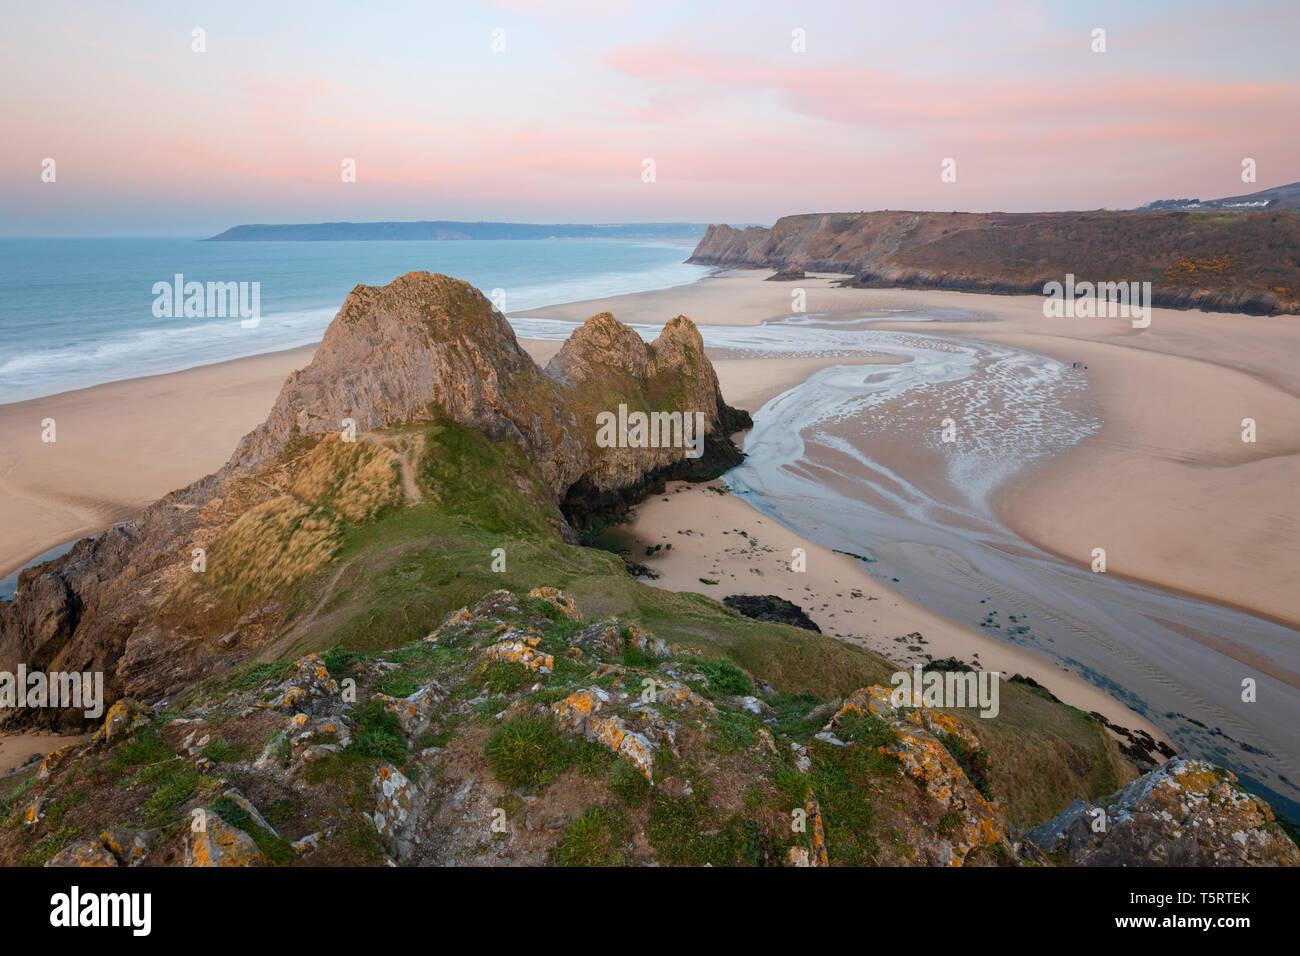 Three Cliffs Bay at sunrise at high tide, Gower Peninsula, Swansea, West Glamorgan, Wales, United Kingdom, Europe Stock Photo